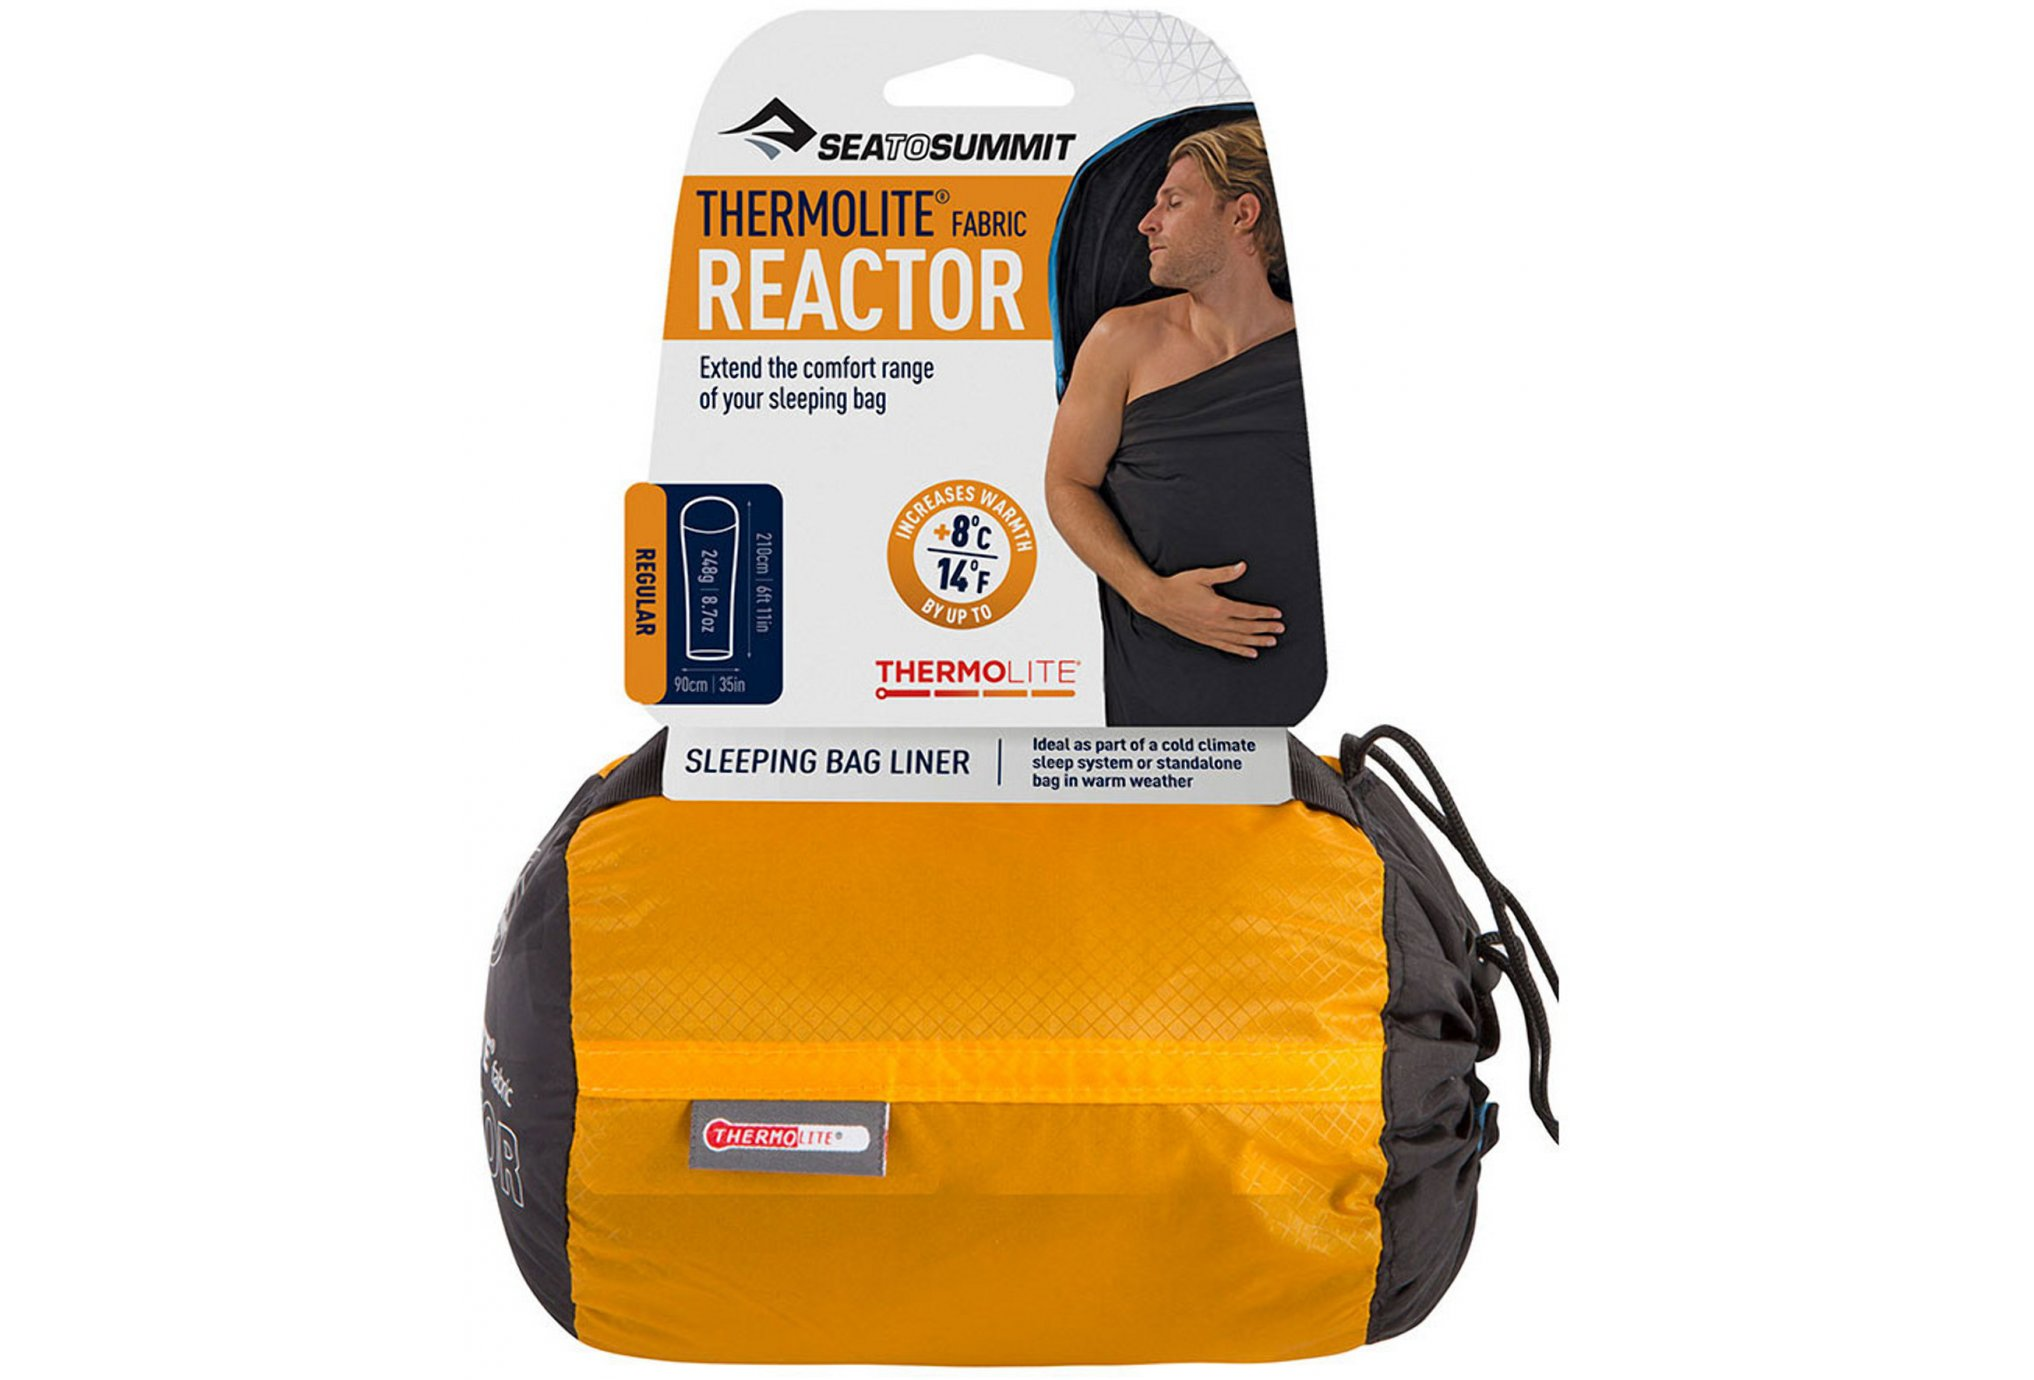 Sea To Summit Drap de sac Thermolite Reactor - R Sac de couchage